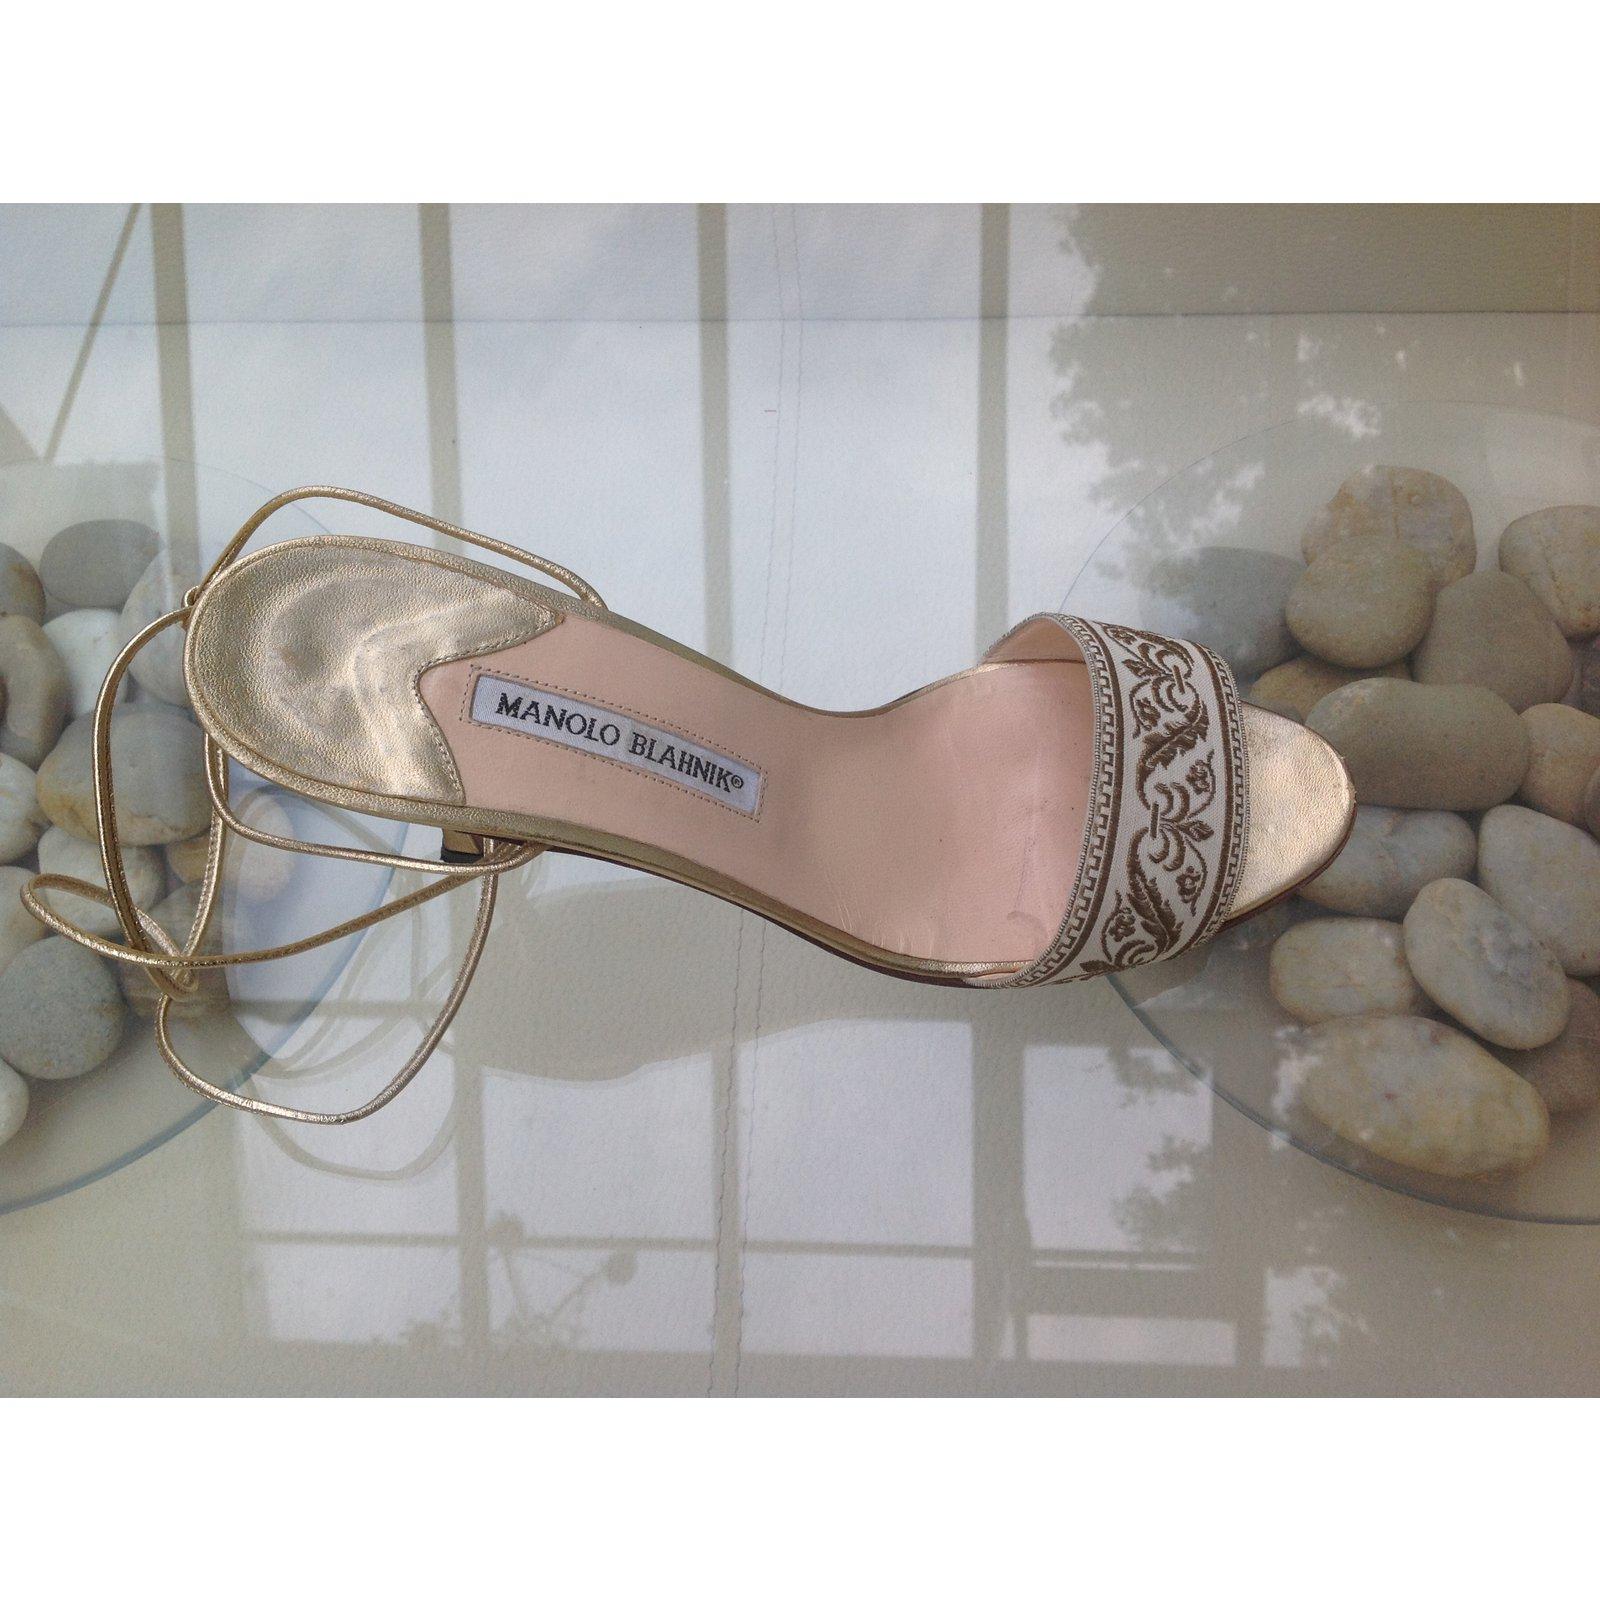 ad39c6d2e Manolo Blahnik Sandals Sandals Cloth Golden ref.45309 - Joli Closet